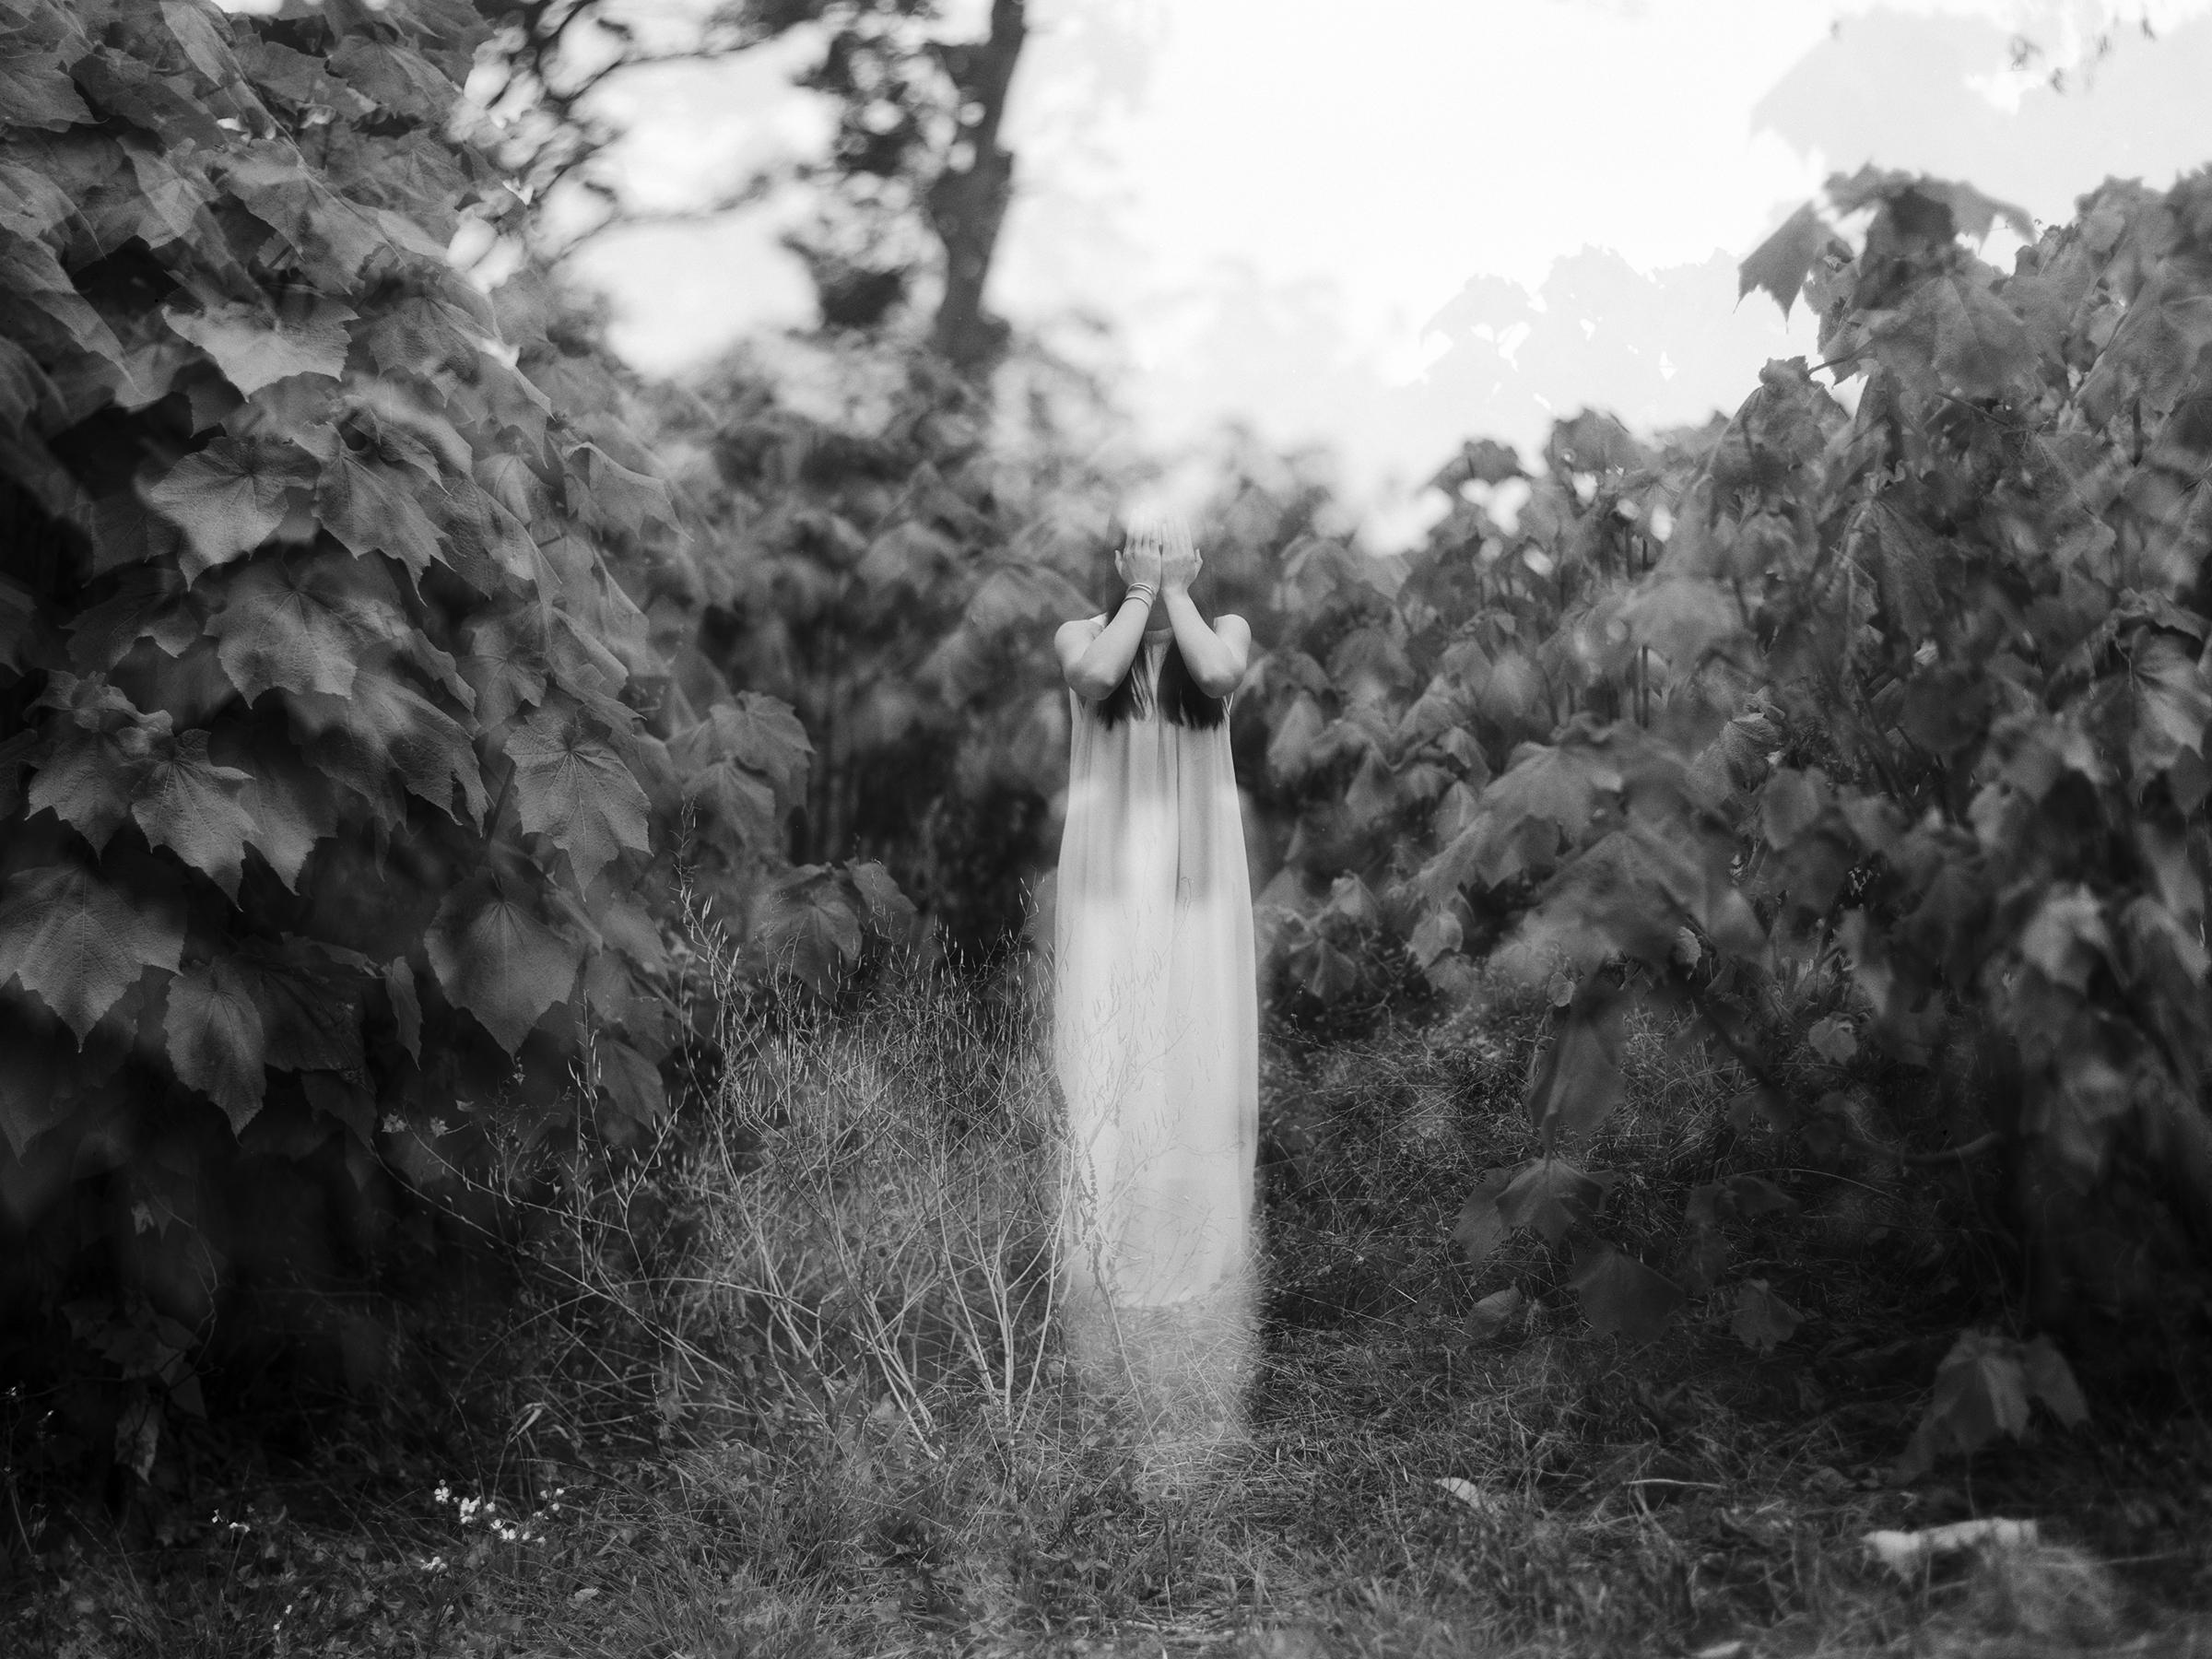 Gordon Szeto, Untitled